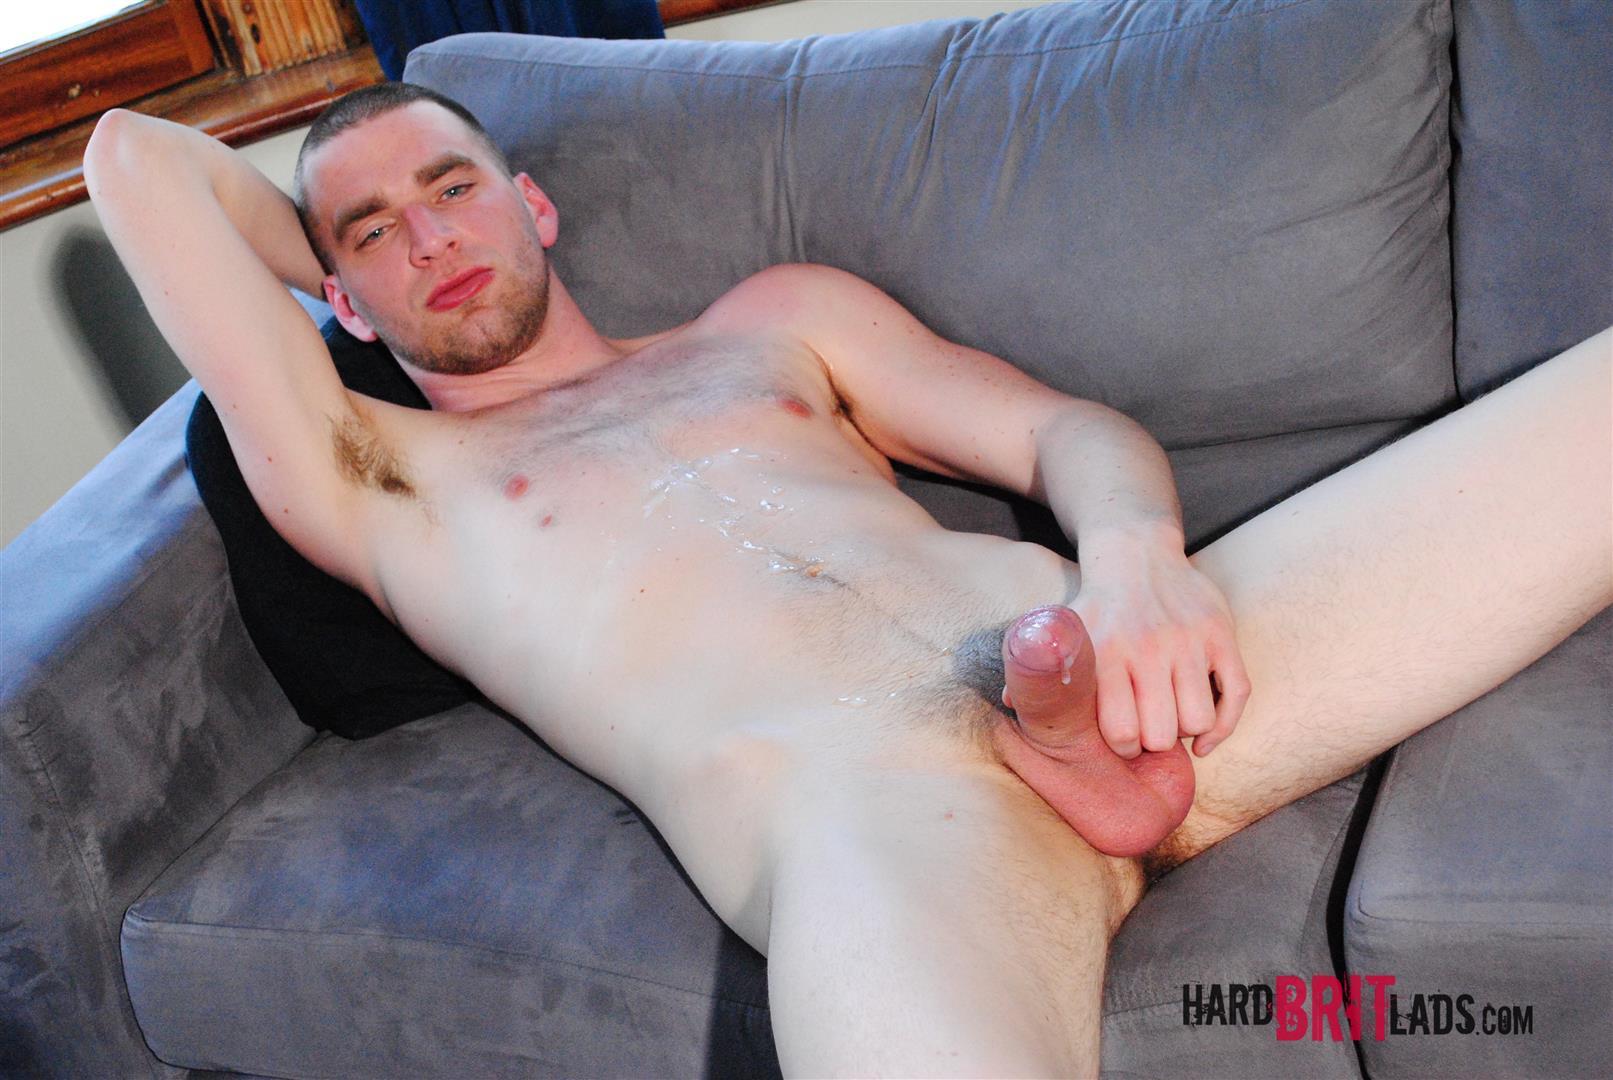 Hard Brit Lads Blake D Big Uncut Cock Masturbation Amateur Gay Porn 22 British Jock Playing With His Massive Uncut Cock Squirts A Load